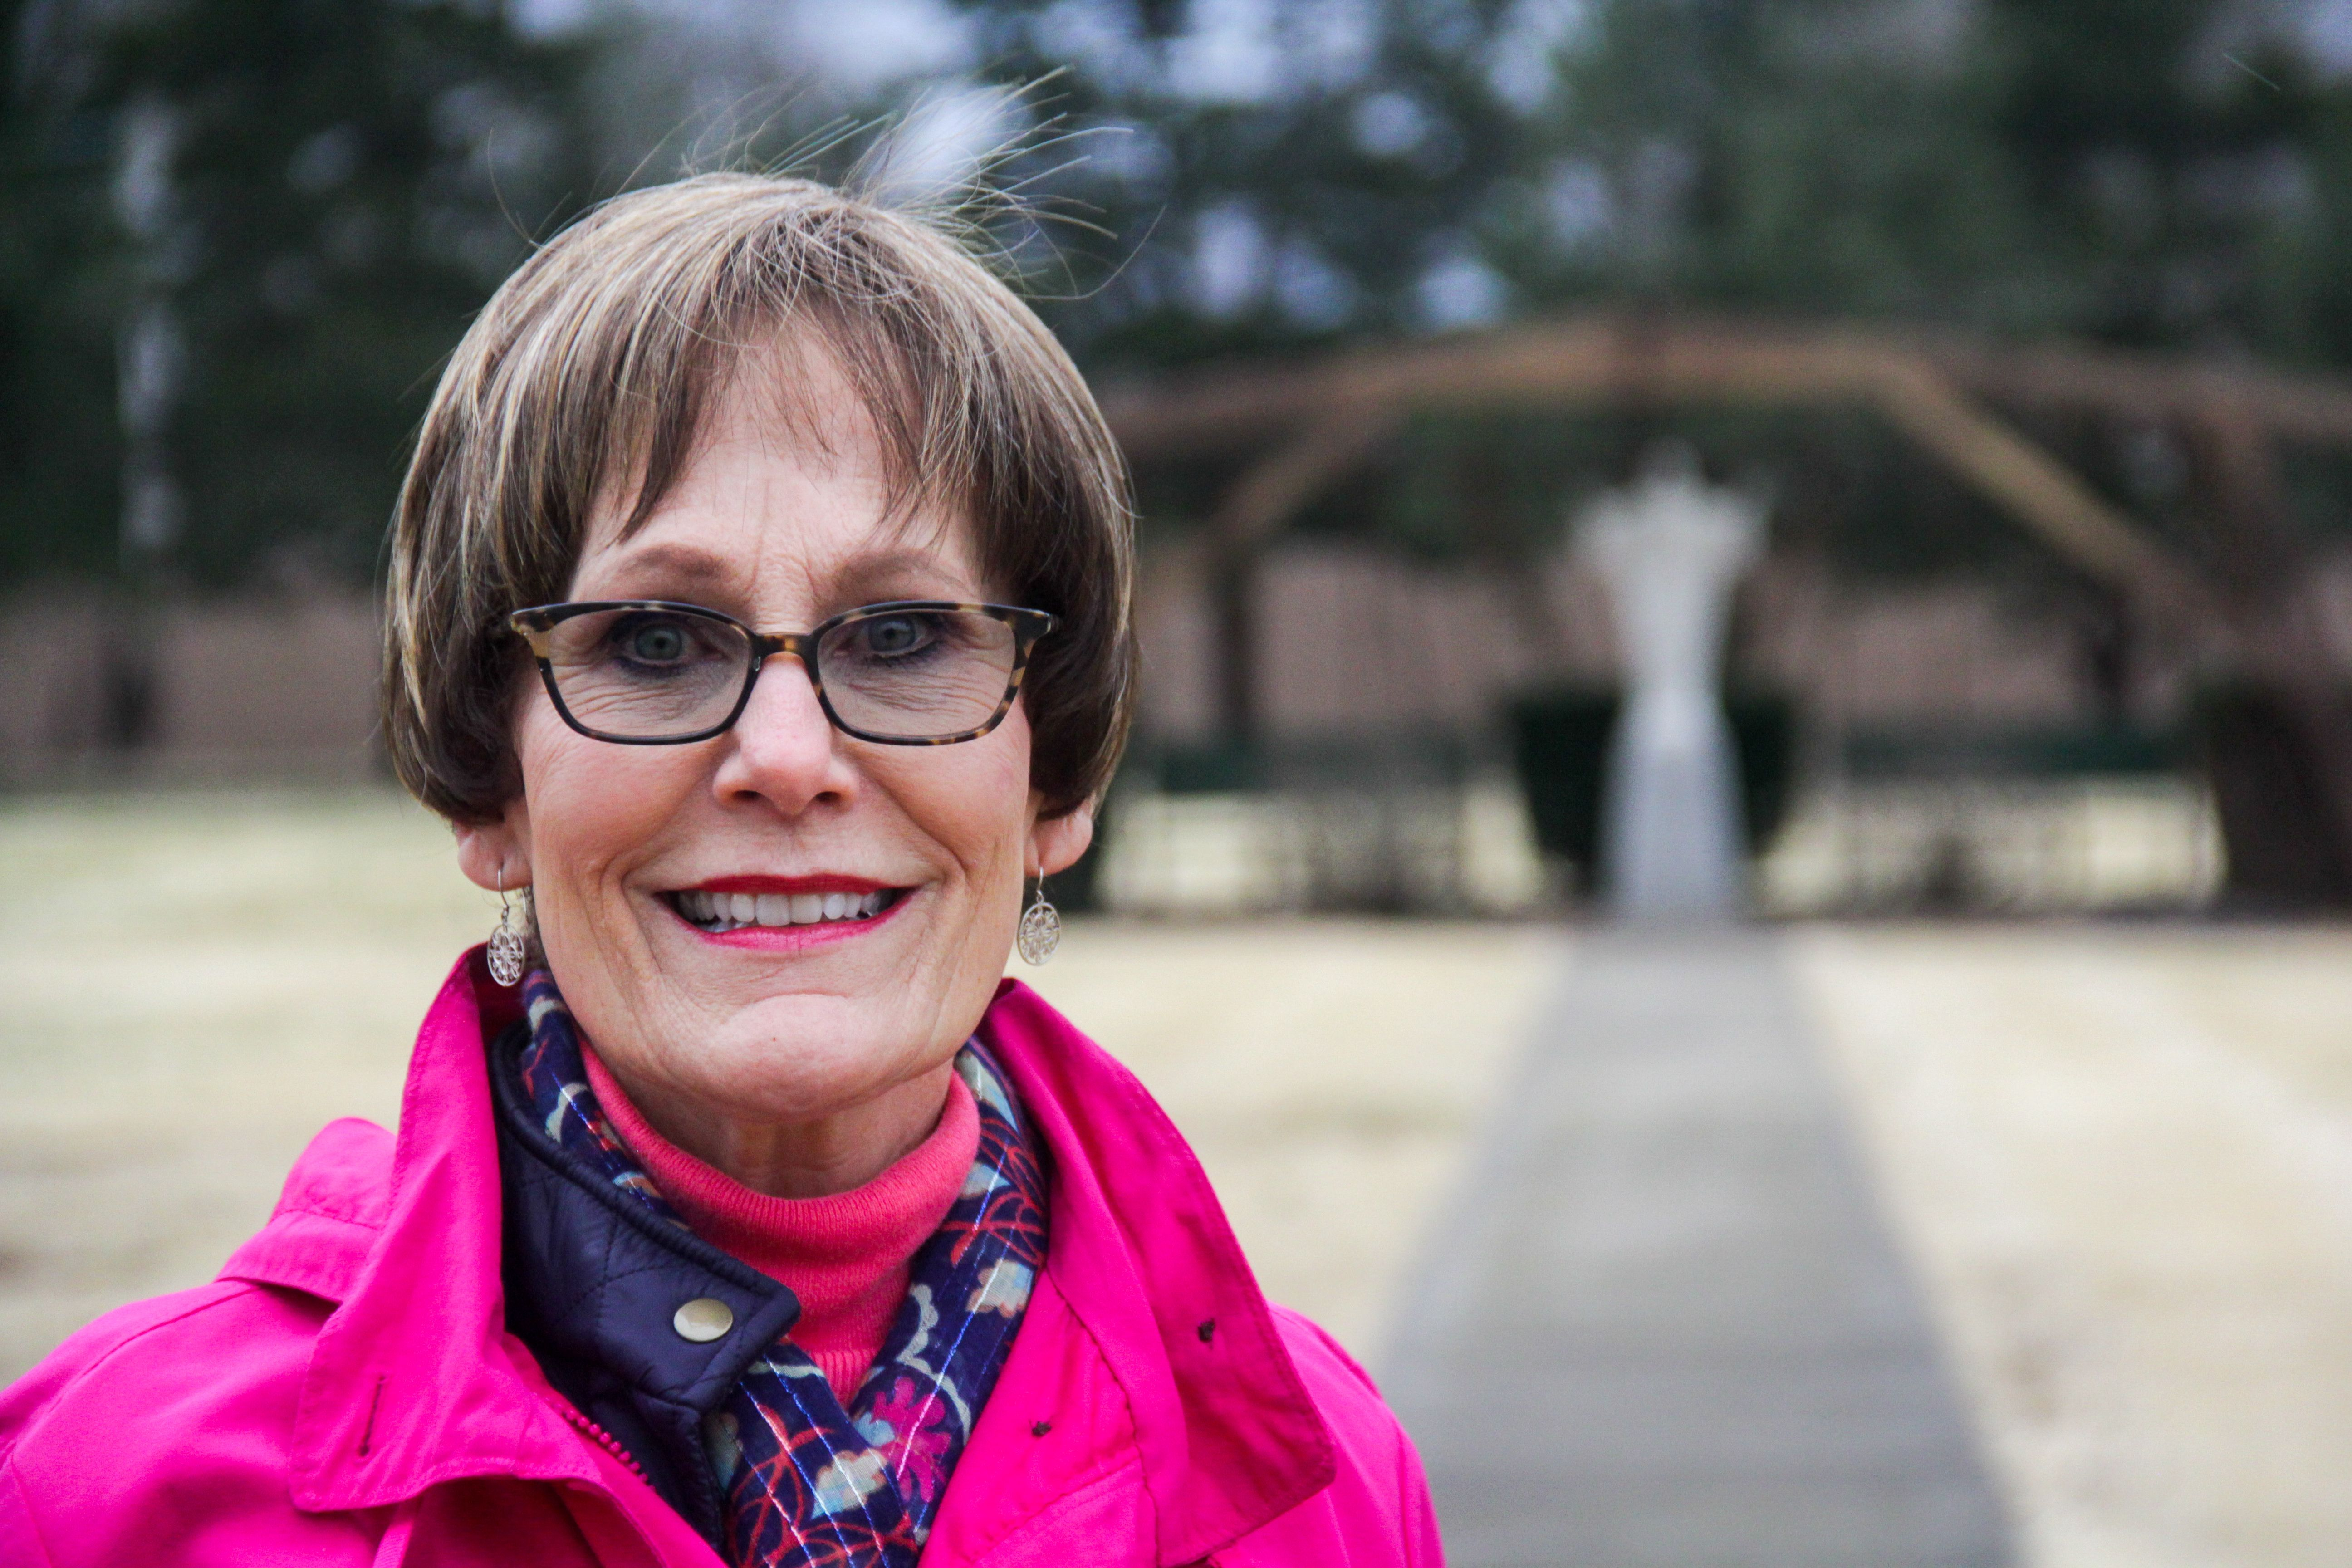 Jana Hukriede, CCUSA 2019 Volunteer of the Year